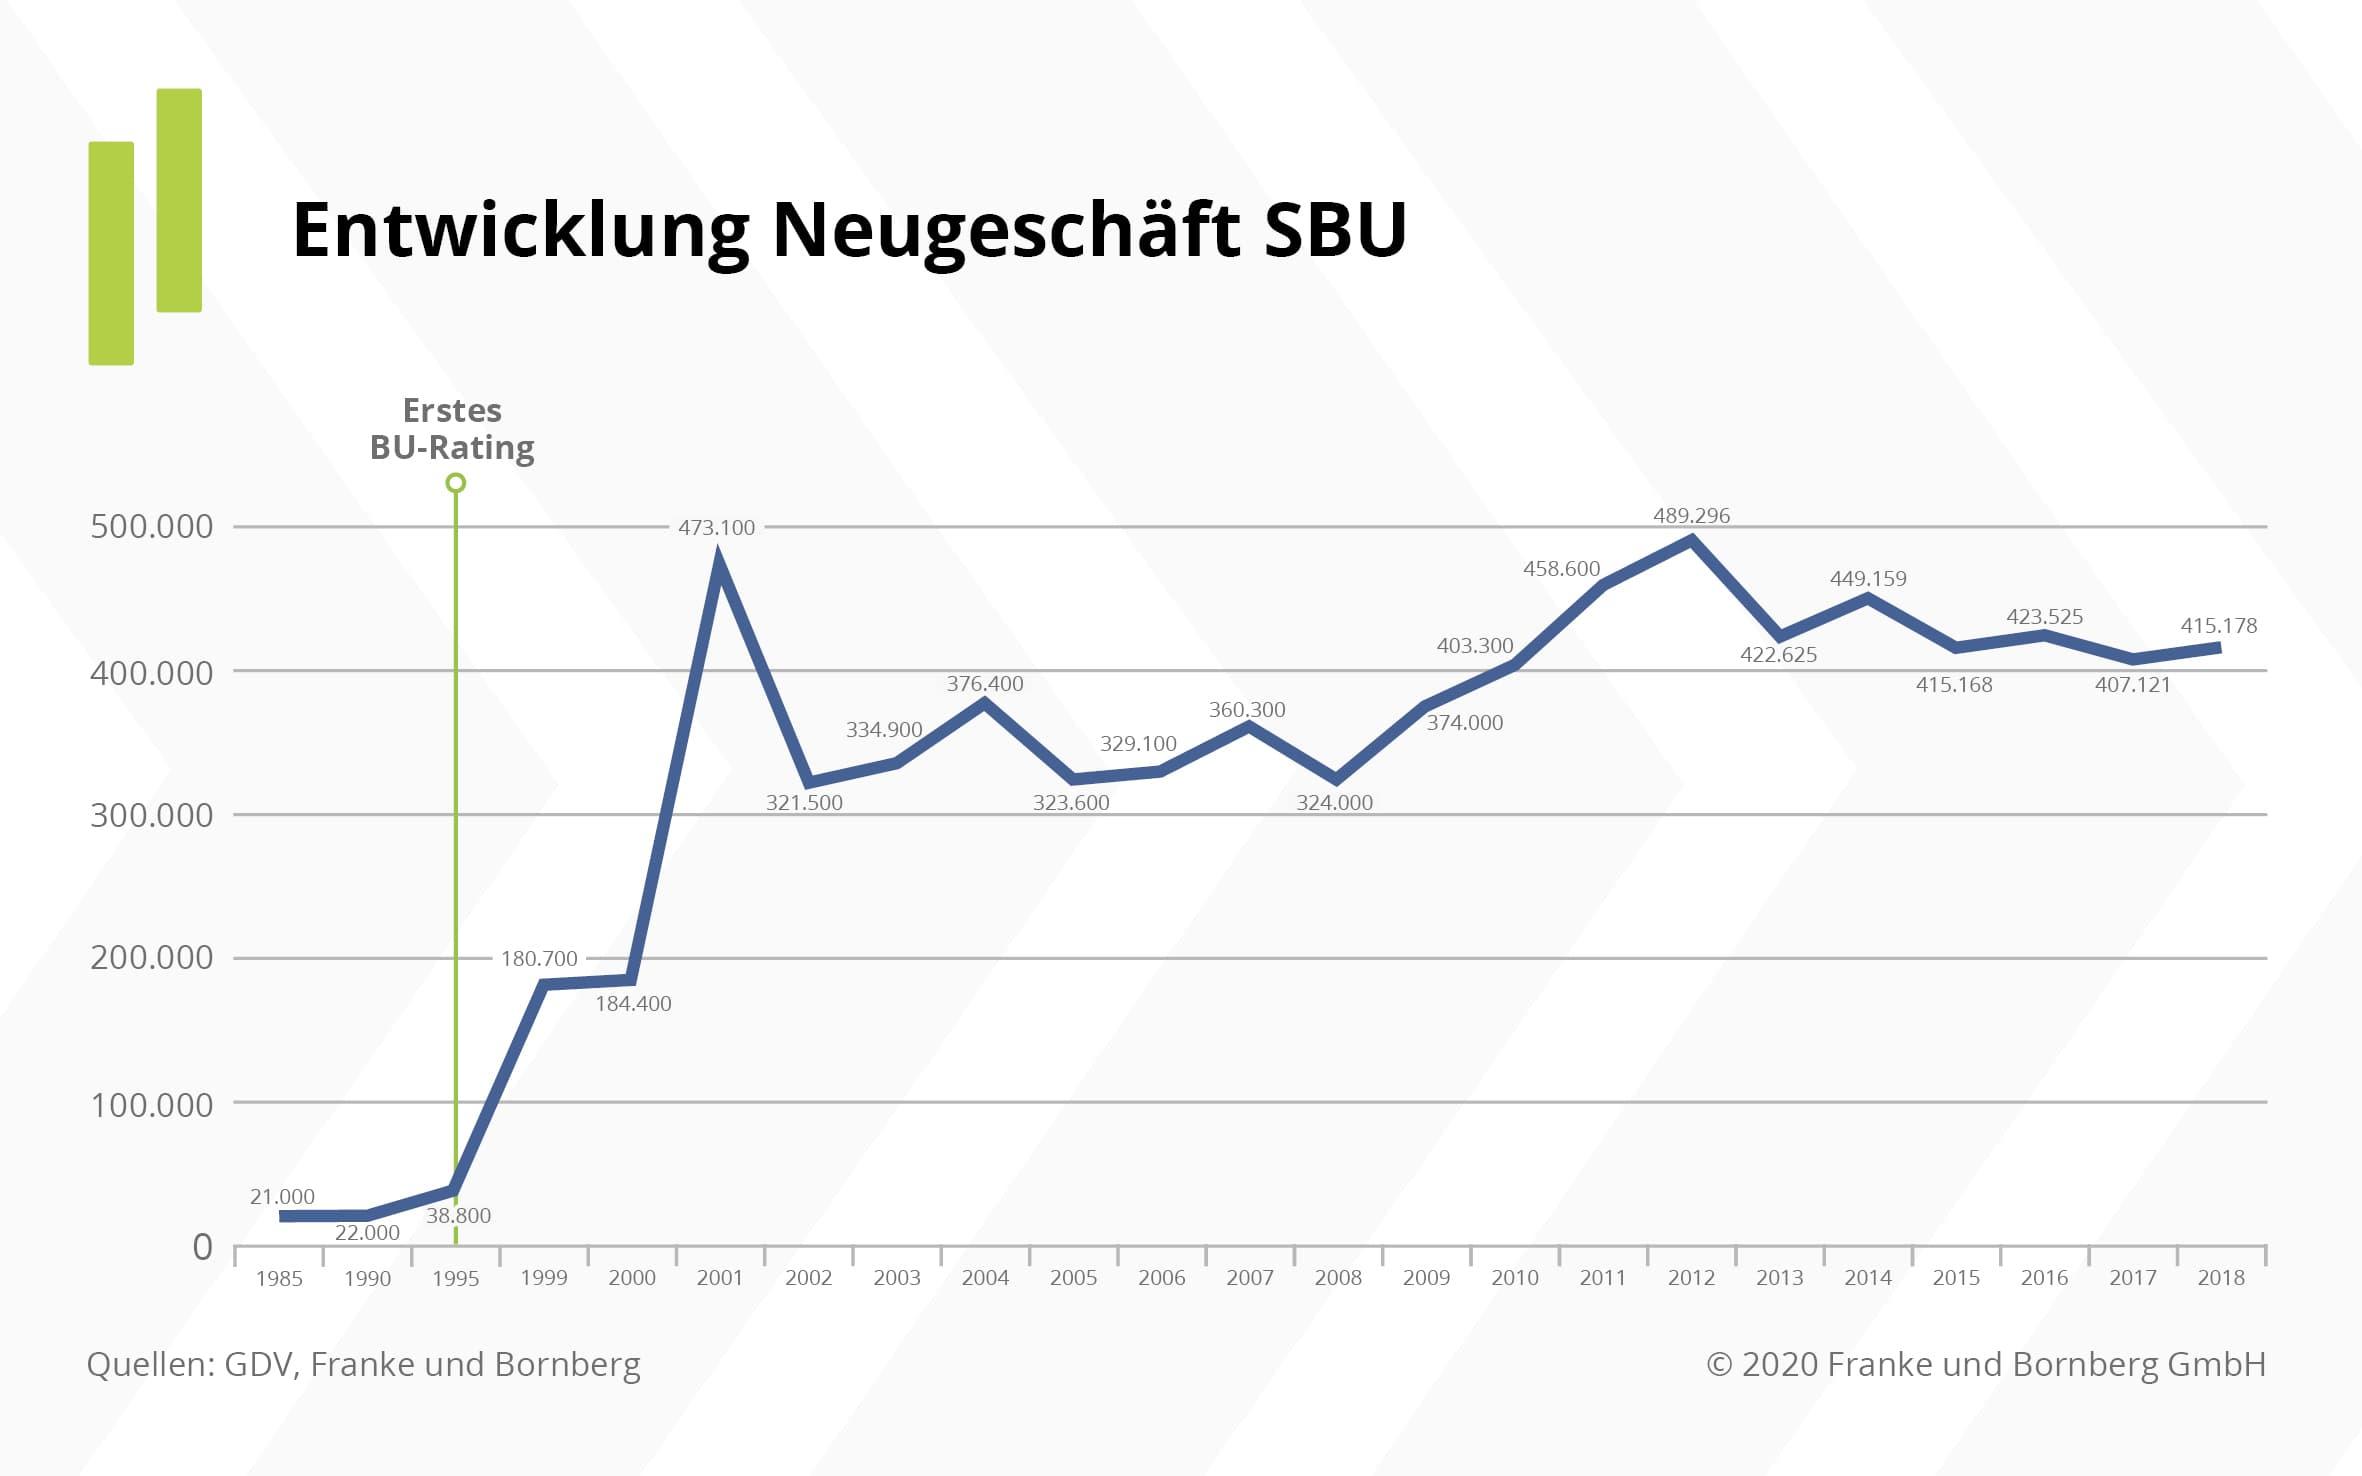 Entwicklung Neugeschäft SBU - Franke & Bornberg